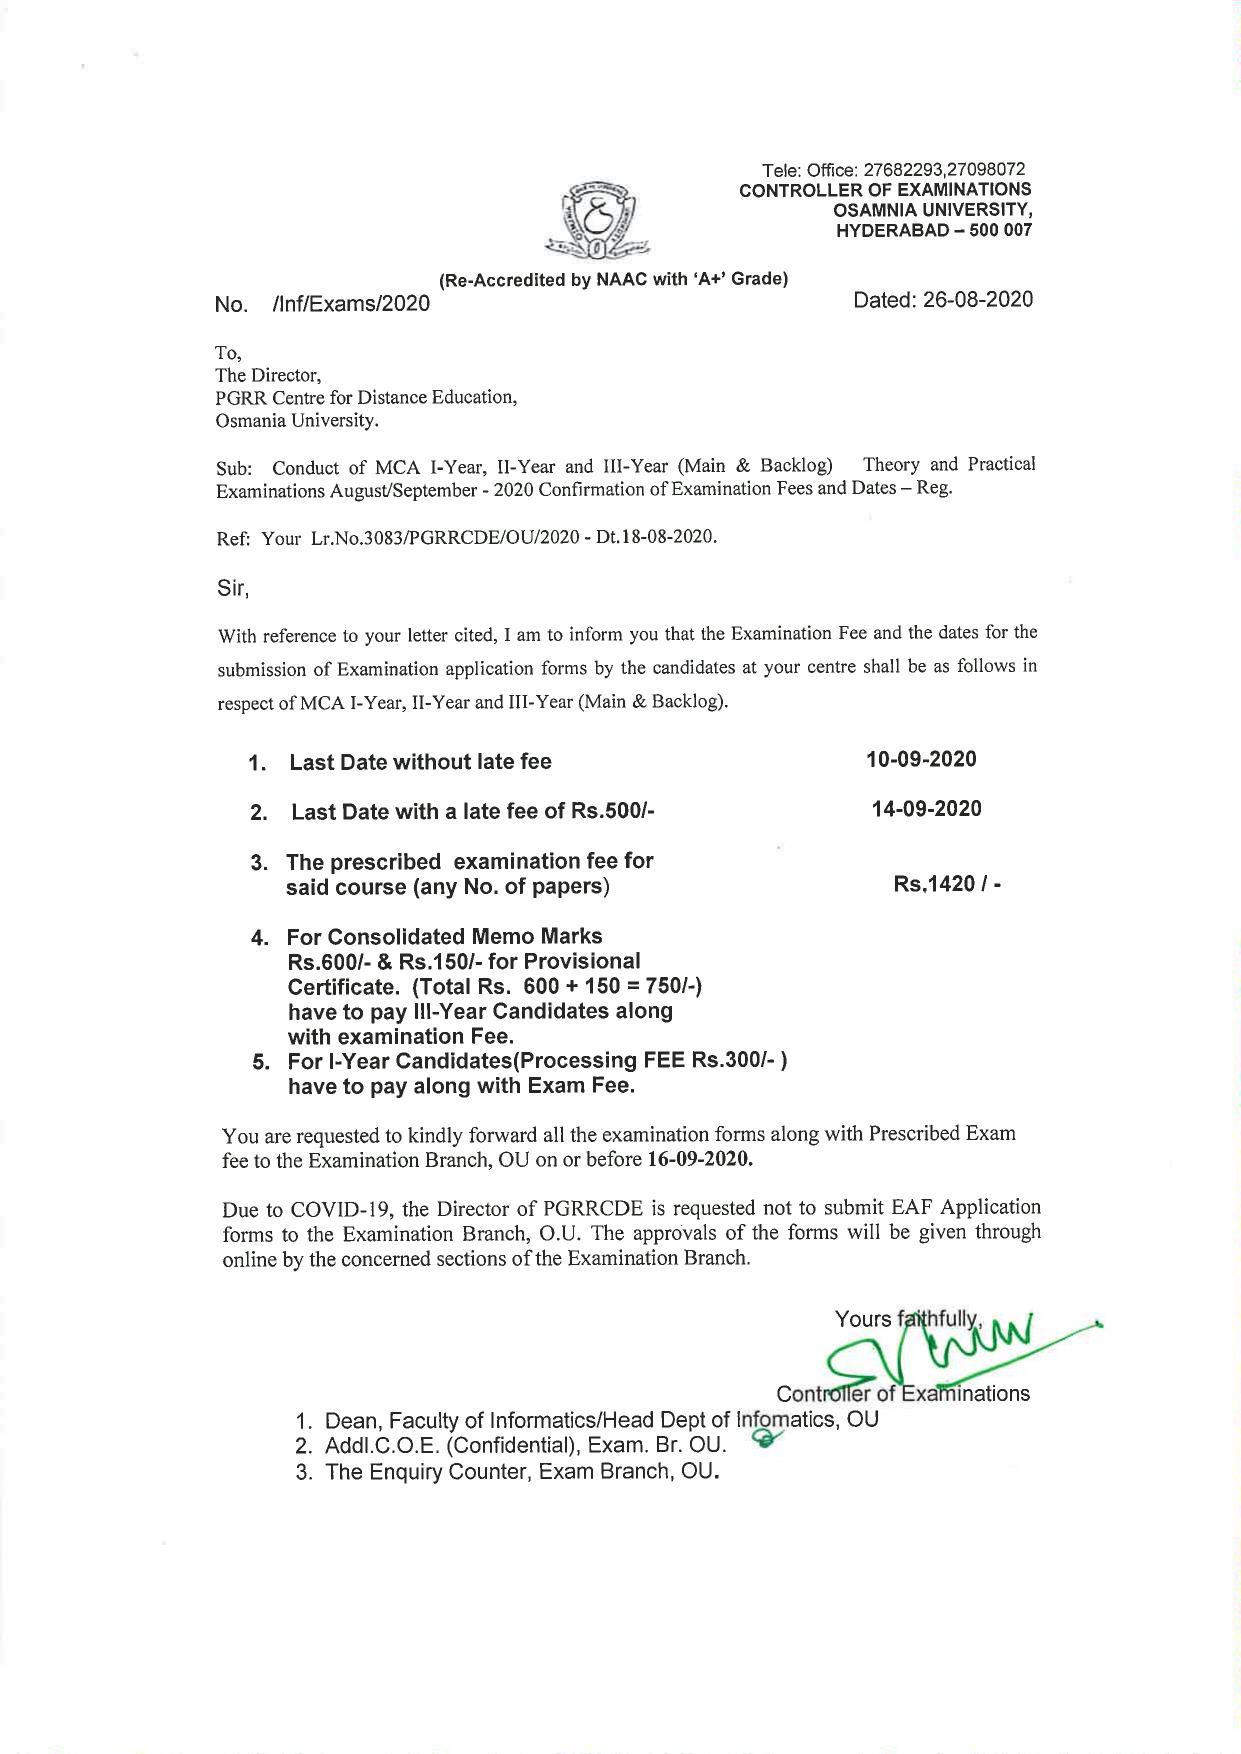 Osmania University MCA (CDE) 1st,2nd & 3rd Year (Regular & Backlog) Sep 2020 Exam Fee Notification